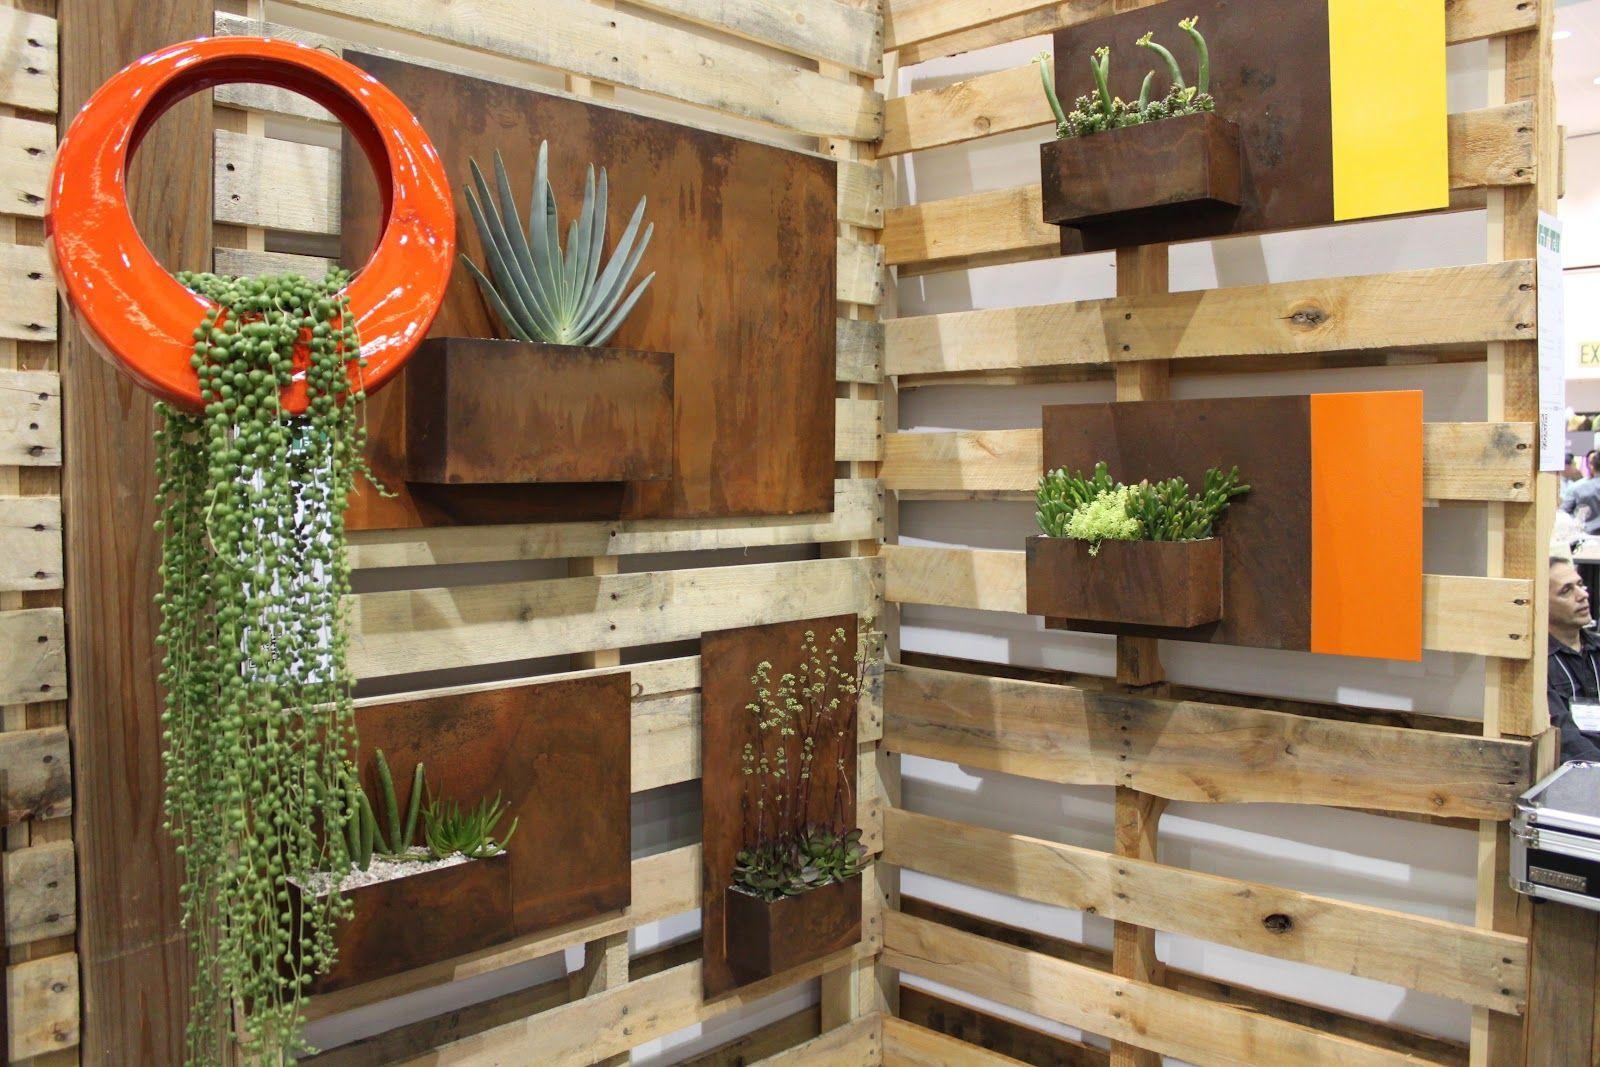 Wall Planter Design Ideas Dwell On Design Landscape Idea 2